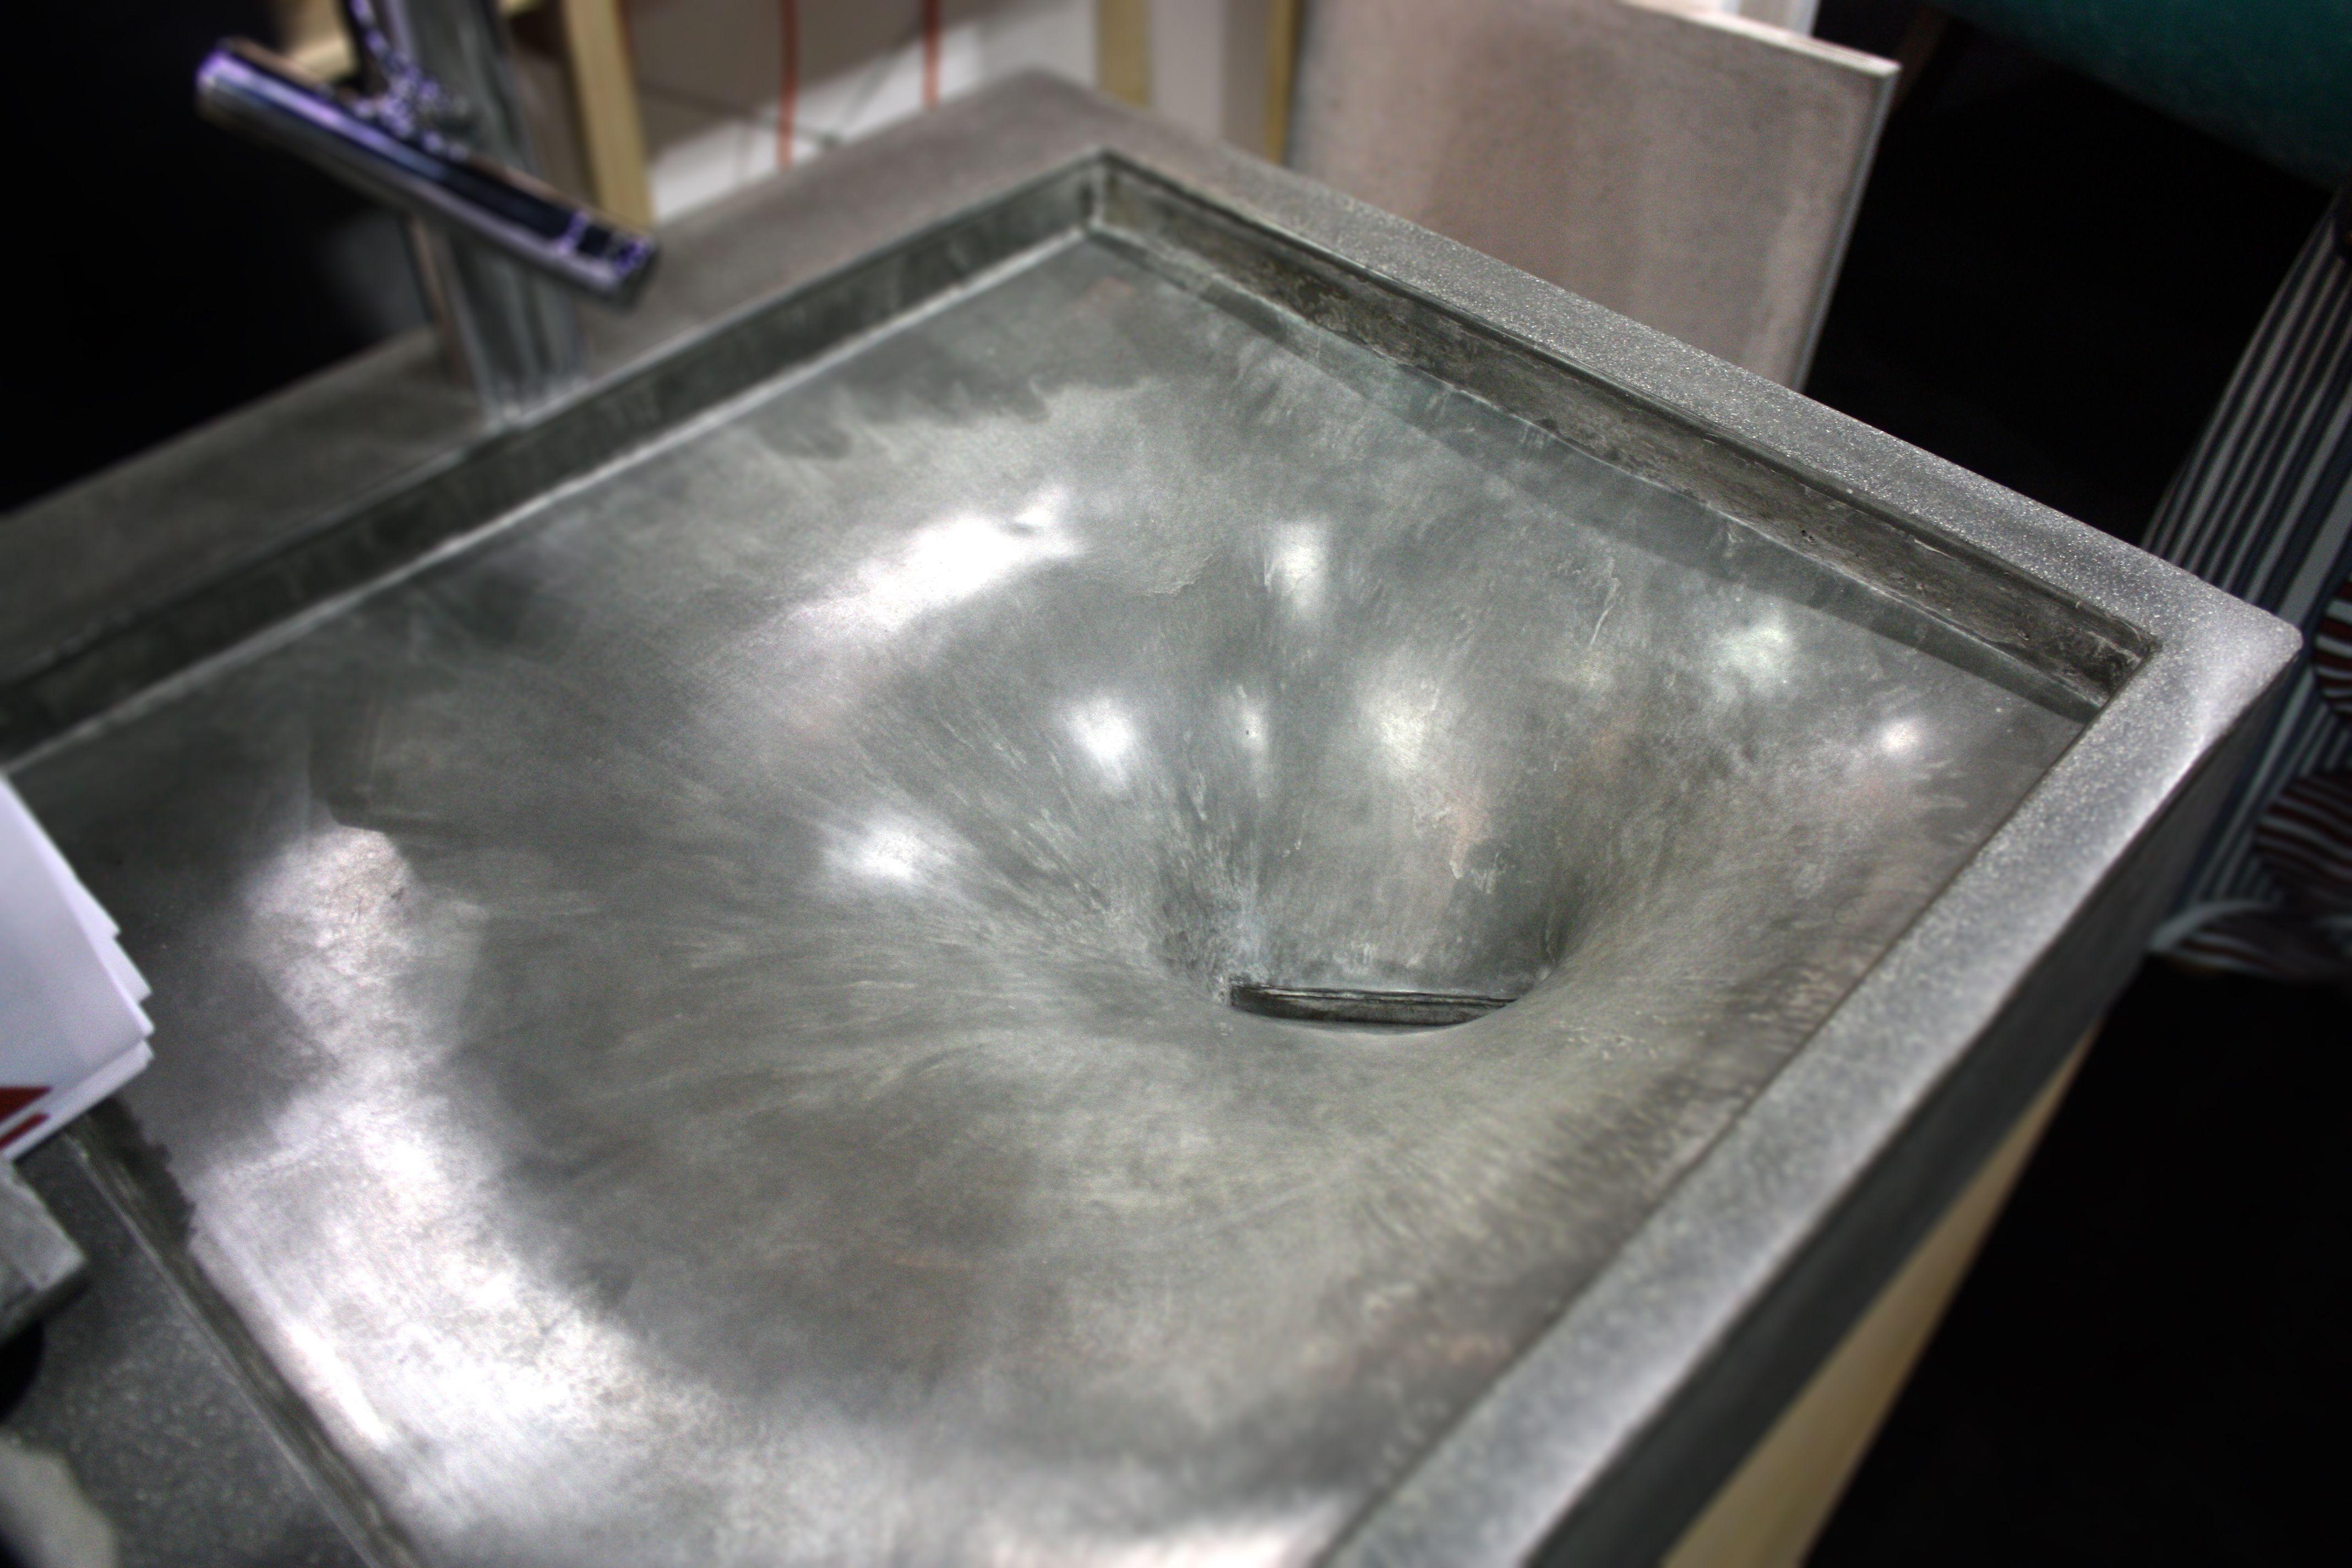 Stretch Concrete Sink Fabric Formed Concrete Sink Concrete Sink Molds Concrete Furniture